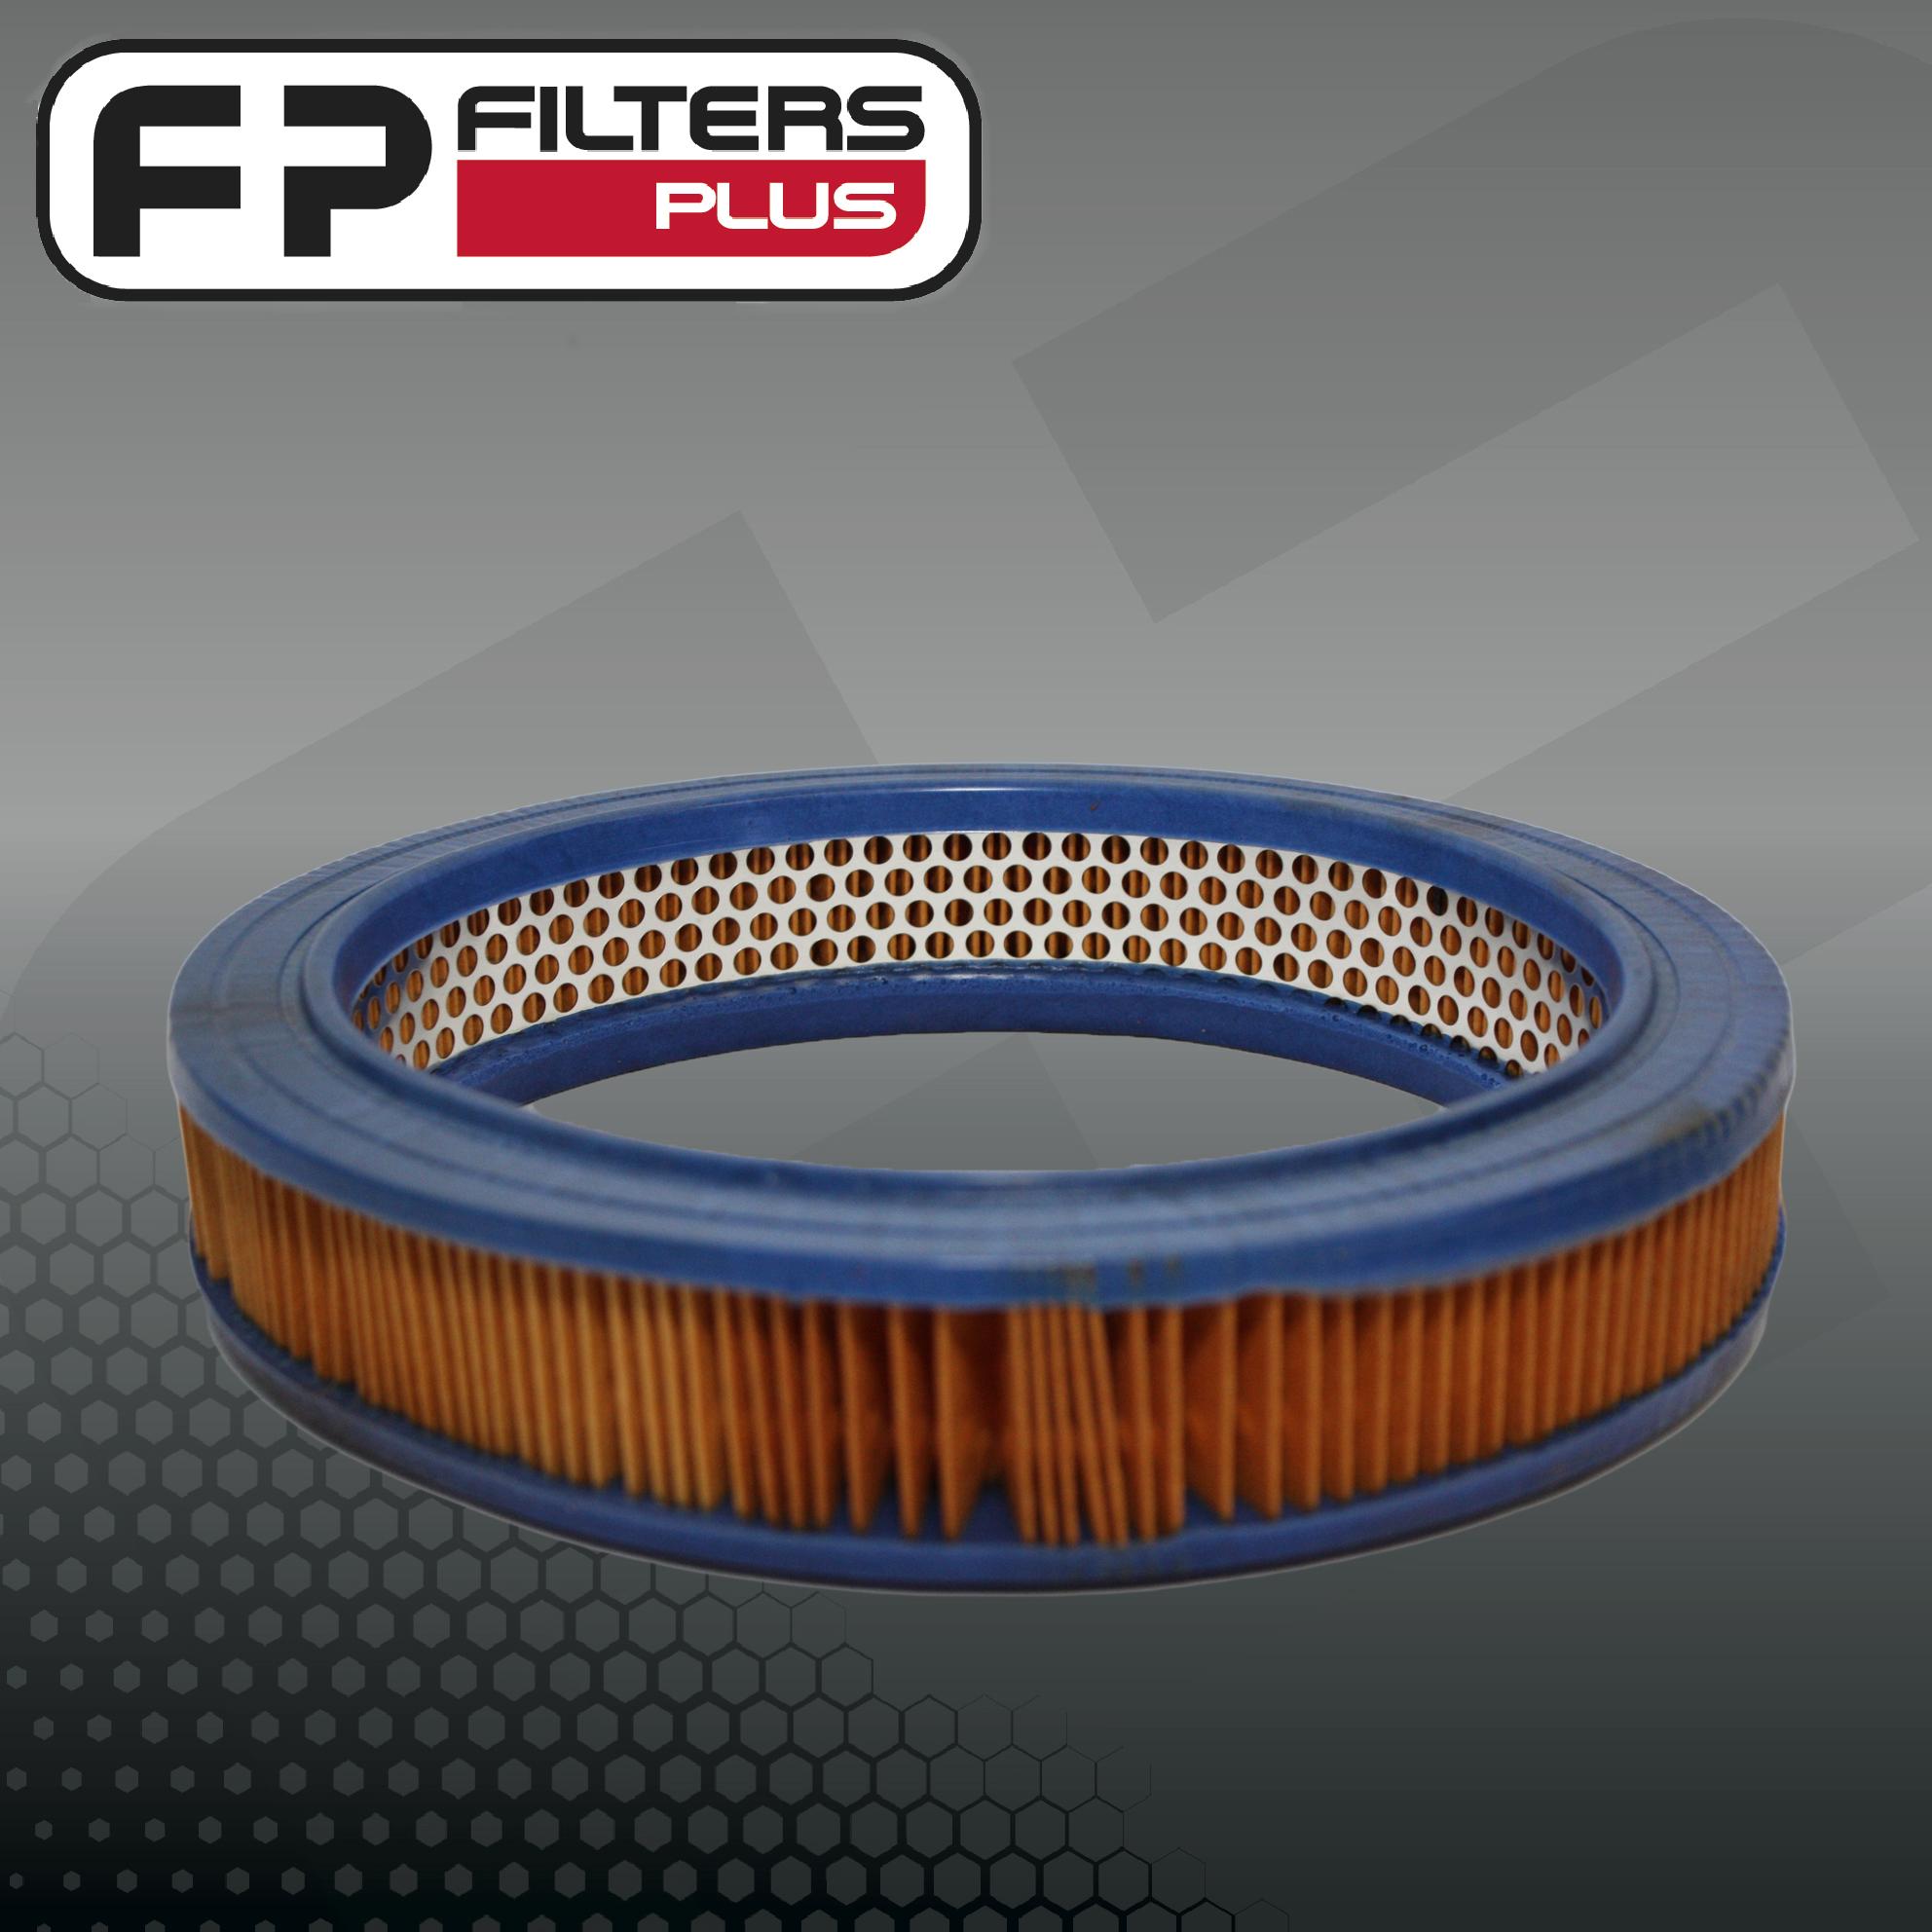 chrysler marine 318 fuel filter  chrysler  get free image